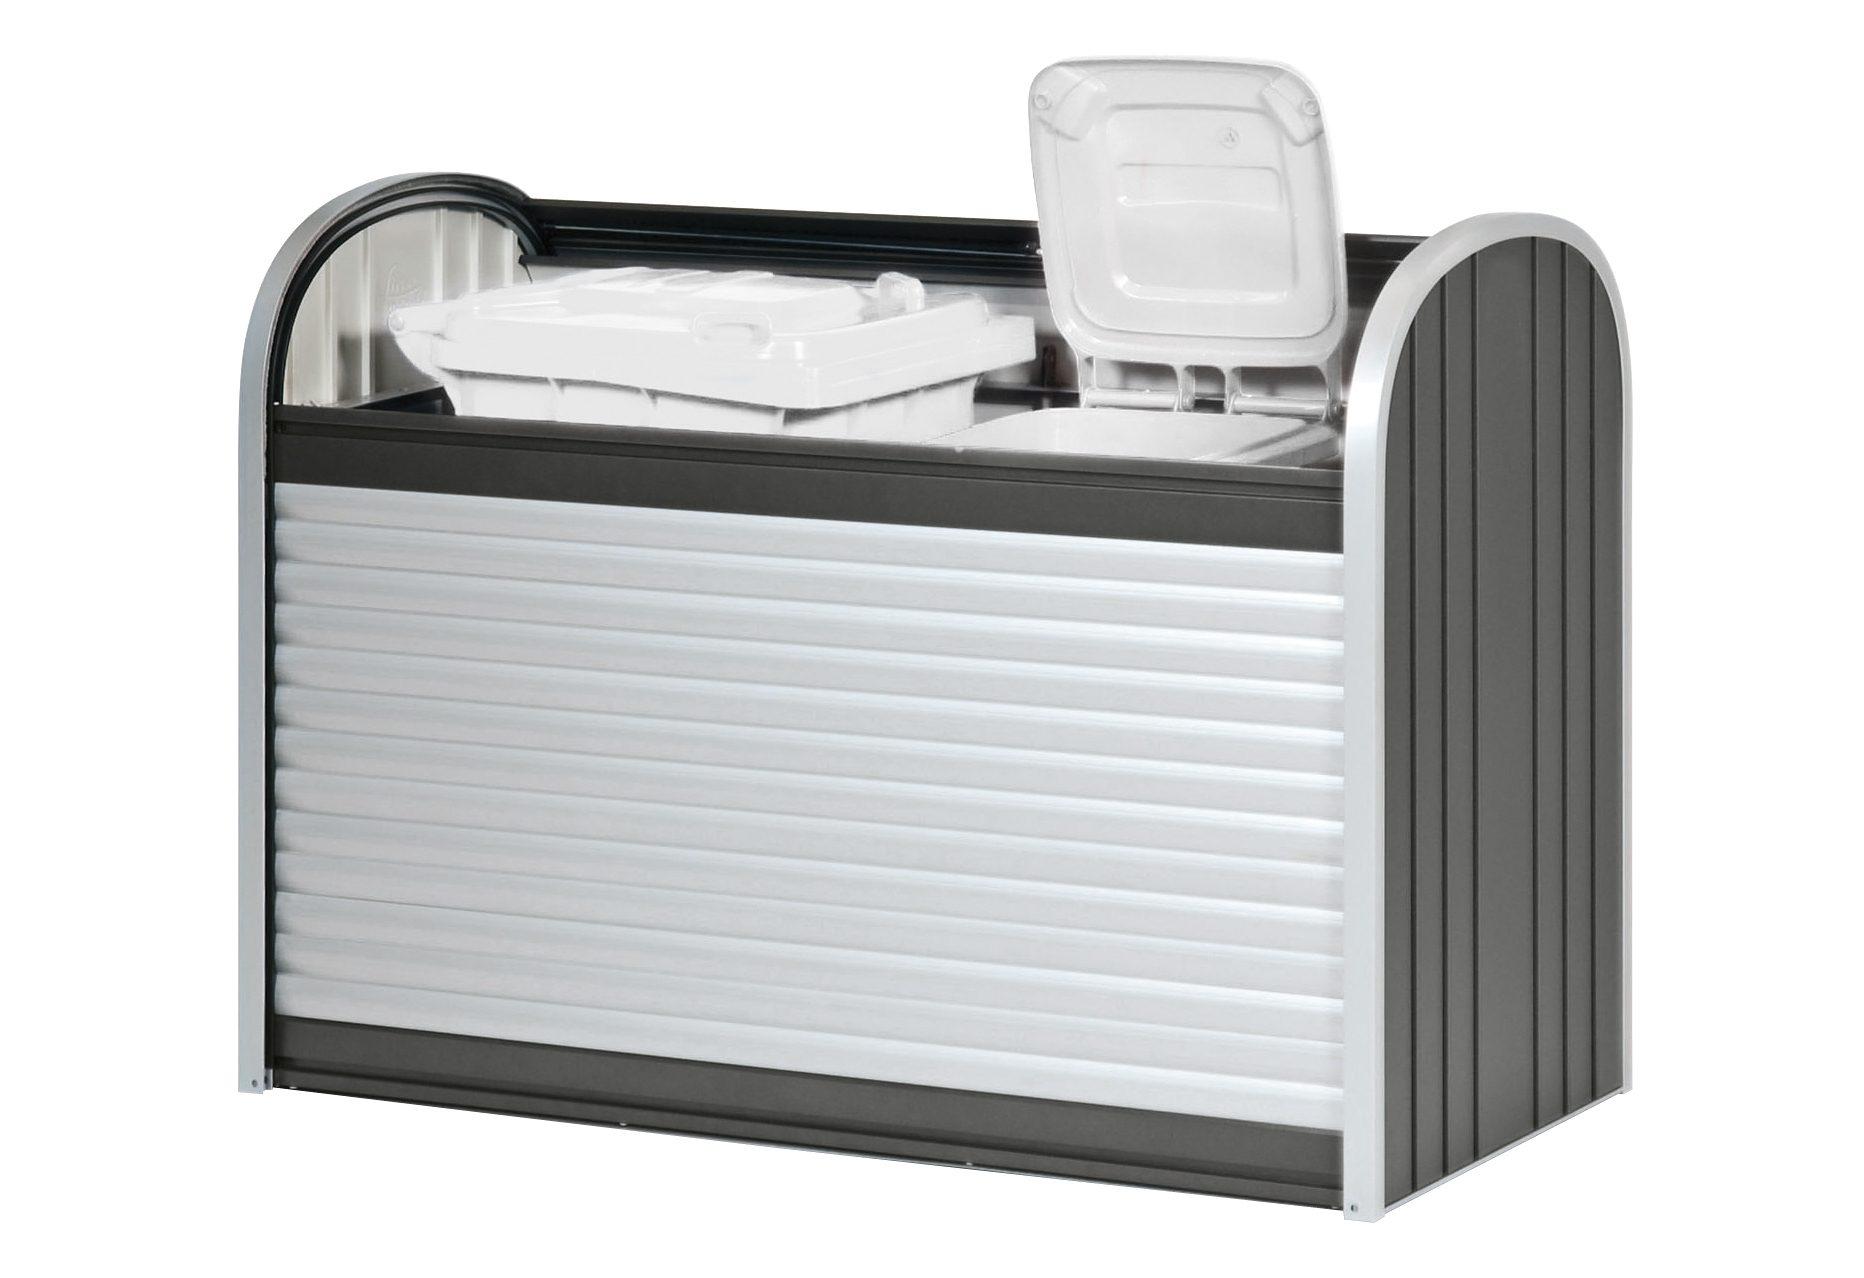 BIOHORT Geräteschrank »StoreMax 120«, B/T/H: 117/73/109 cm